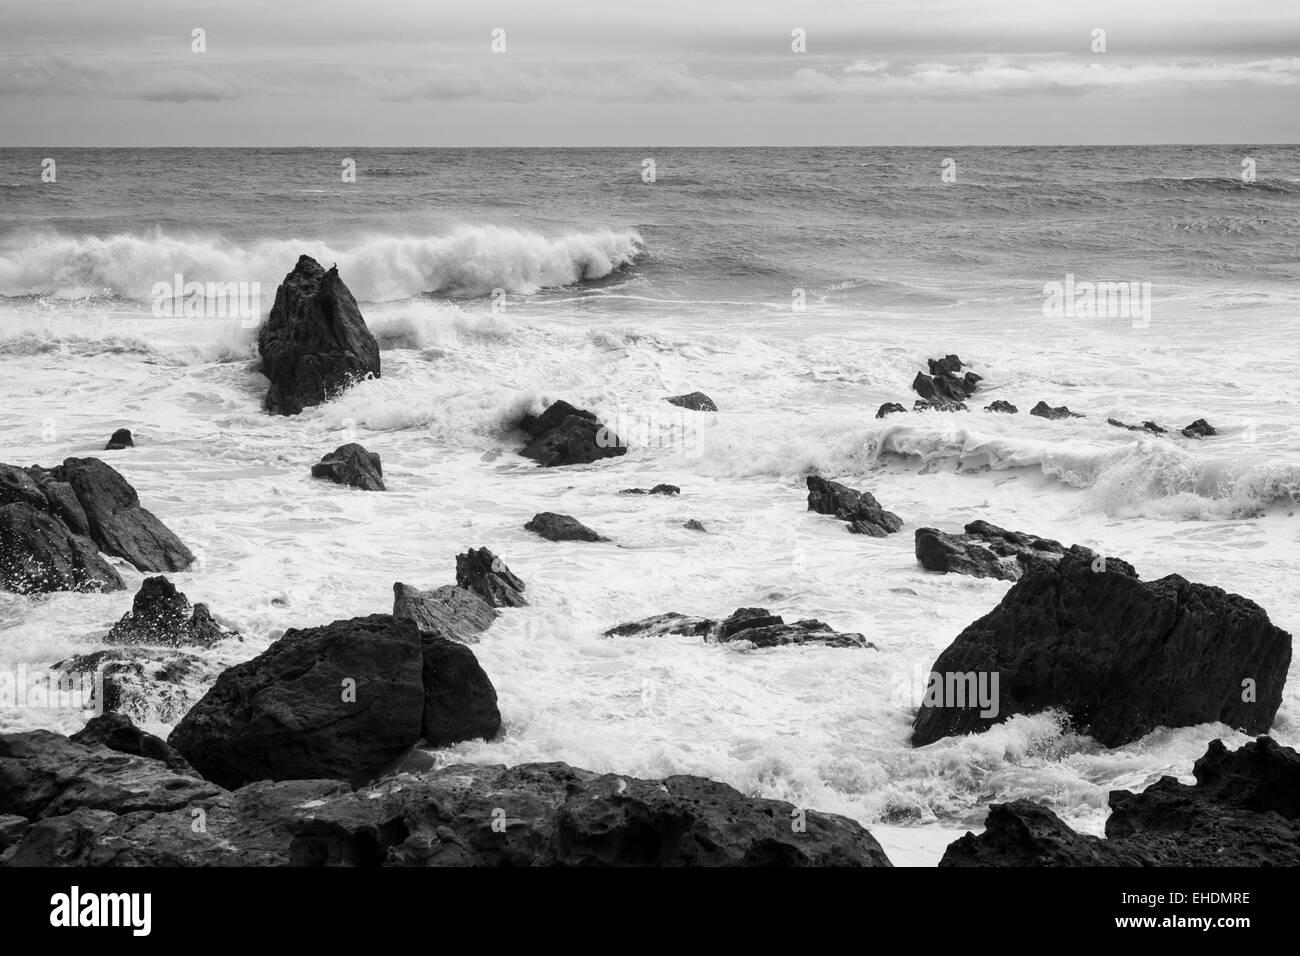 Coast around the base of Mauoa mountain in Tauranga, New Zealand. Black and white seascape - Stock Image